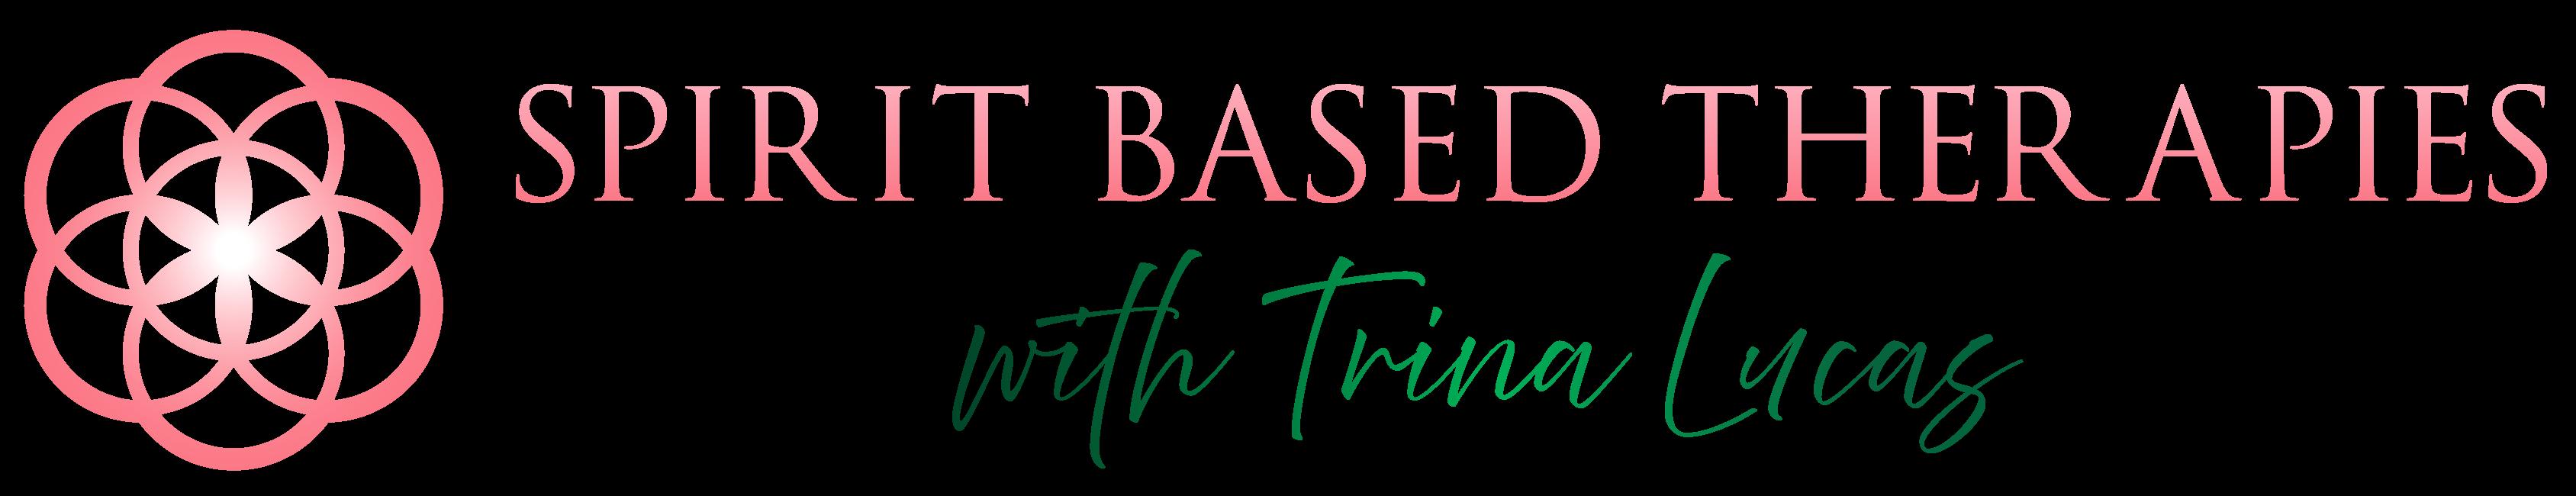 Spirit Based Therapies Trina Lucas